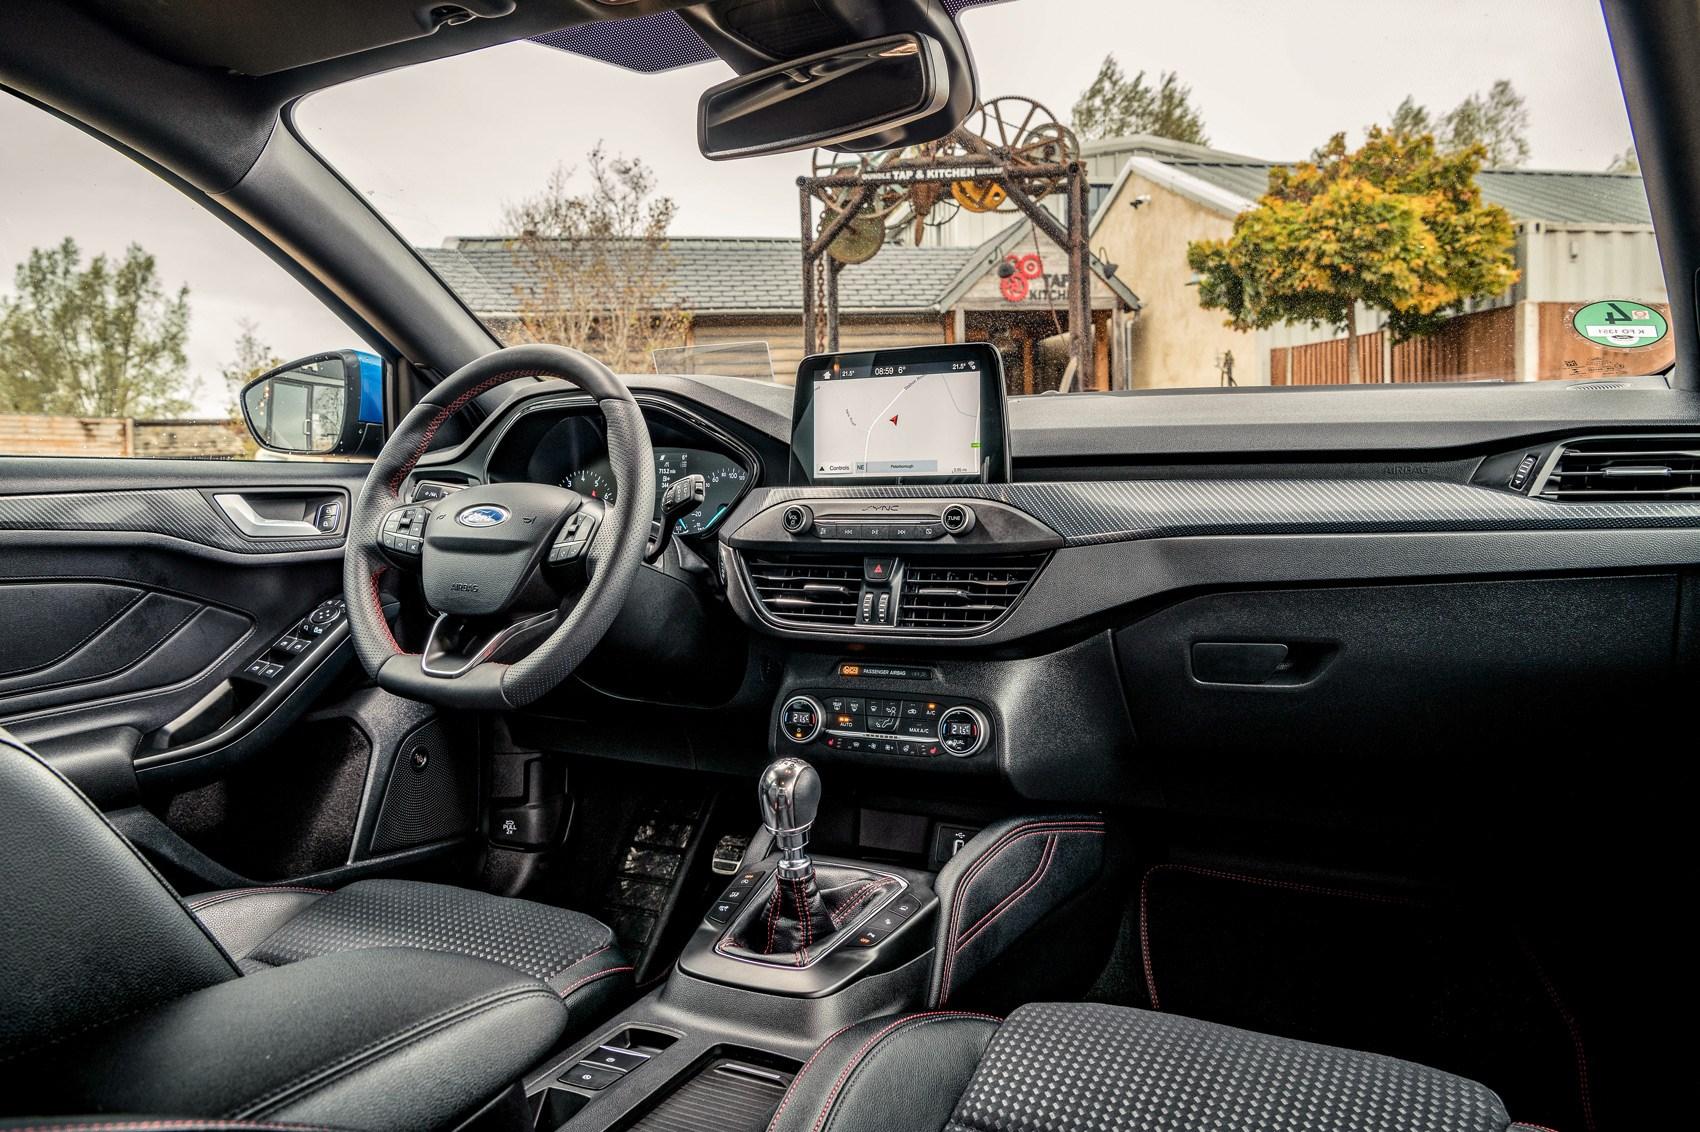 Best hatchbacks 2019: Mercedes A-Class vs Ford Focus vs Kia